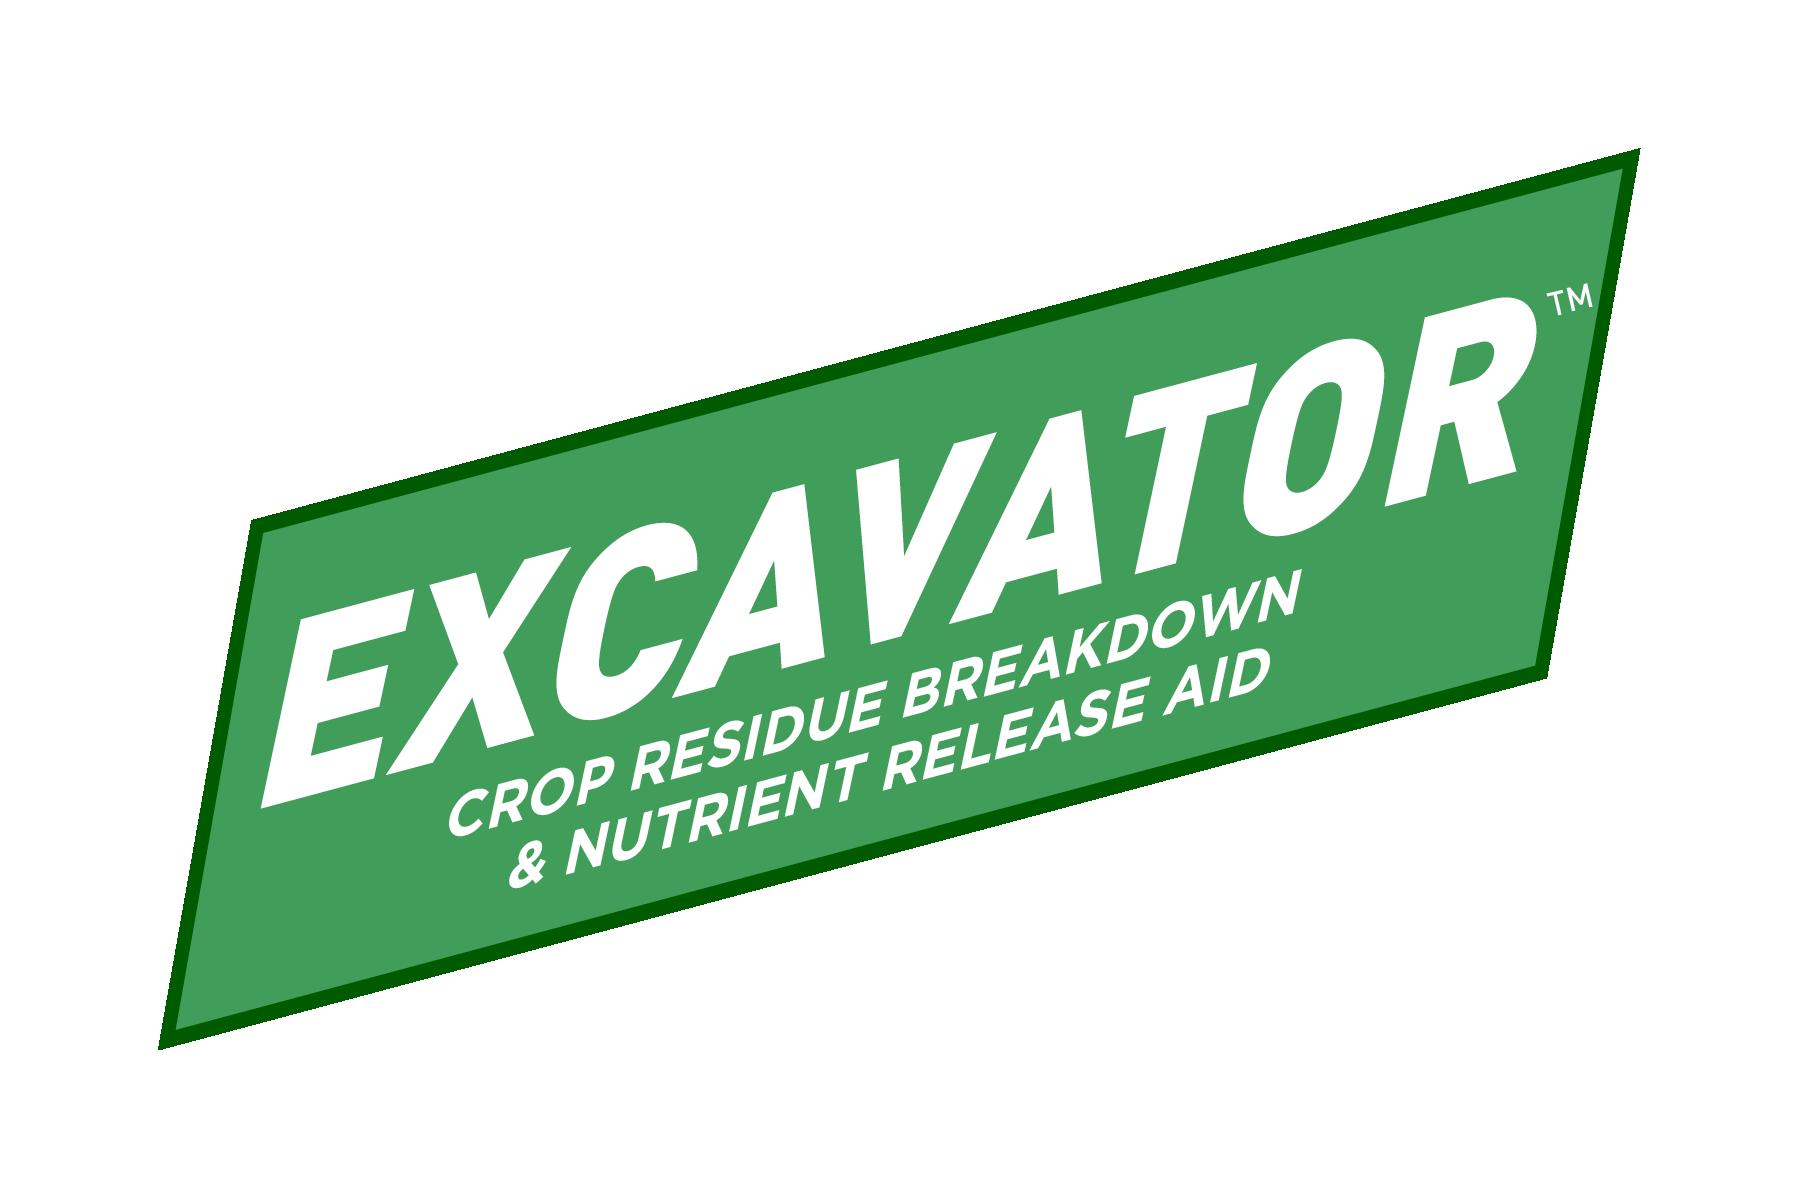 EXCAVATOR™